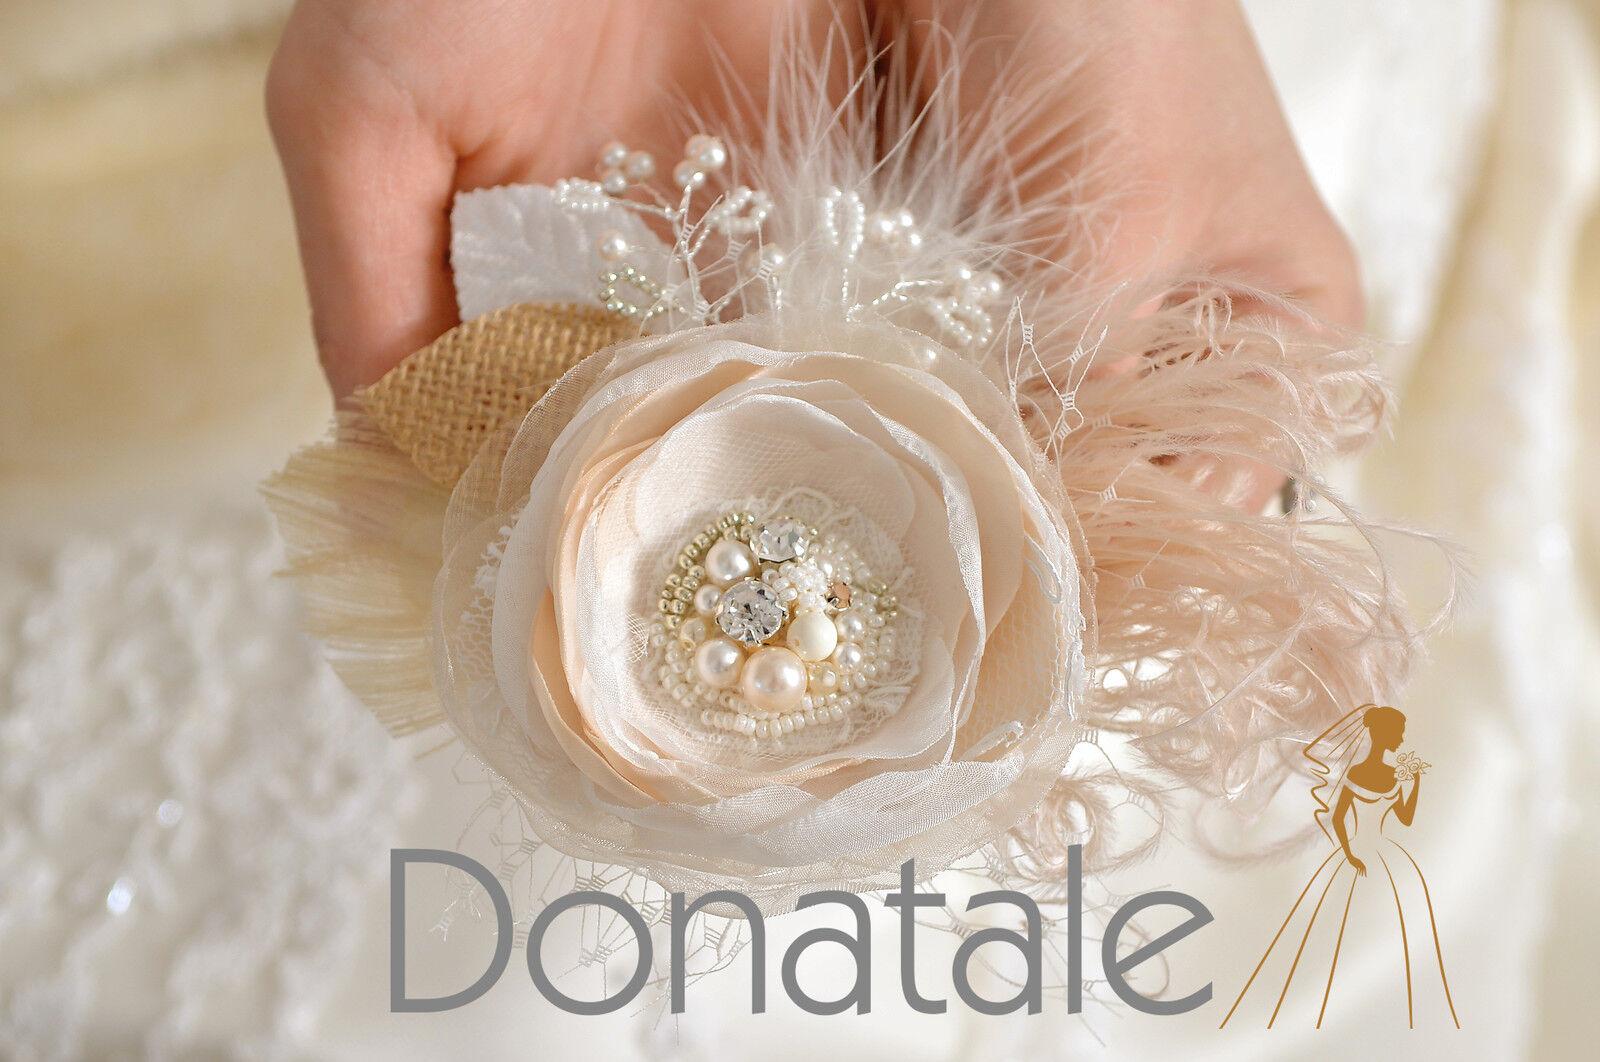 donataleflowers4you